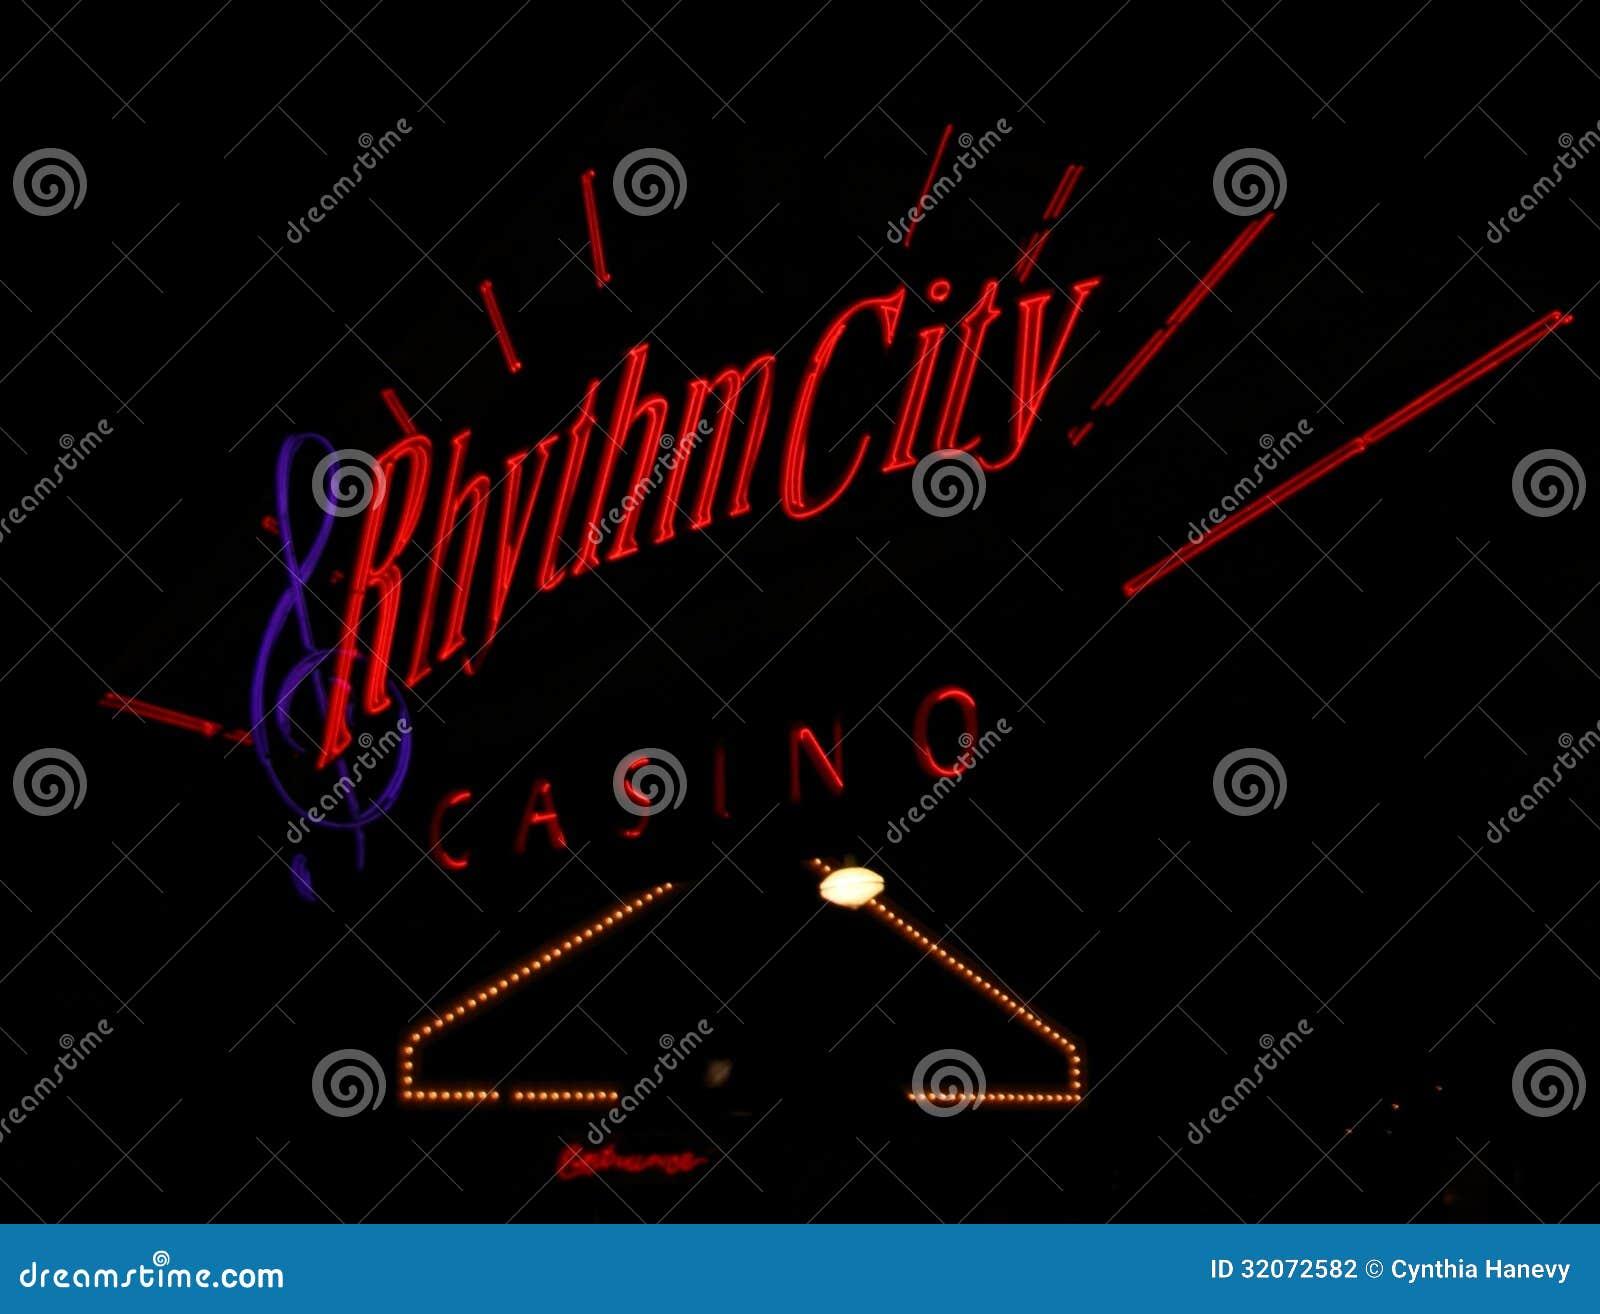 Rhythm city casino west river drive davenport ia